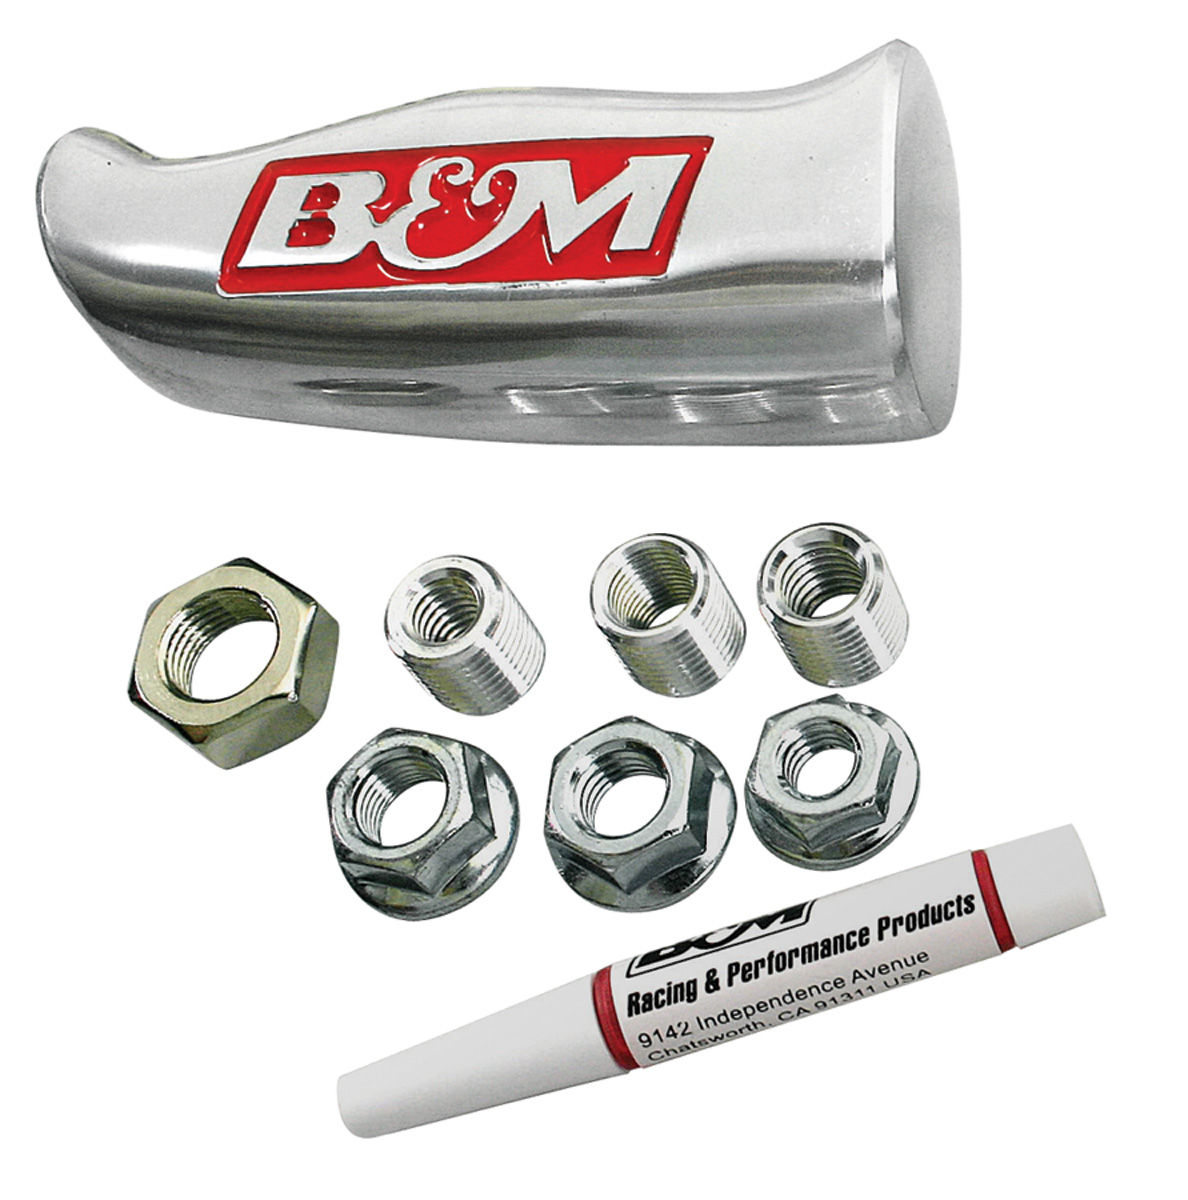 Handle, 61-88 GM, Shifter, B&M, Brushed Aluminum